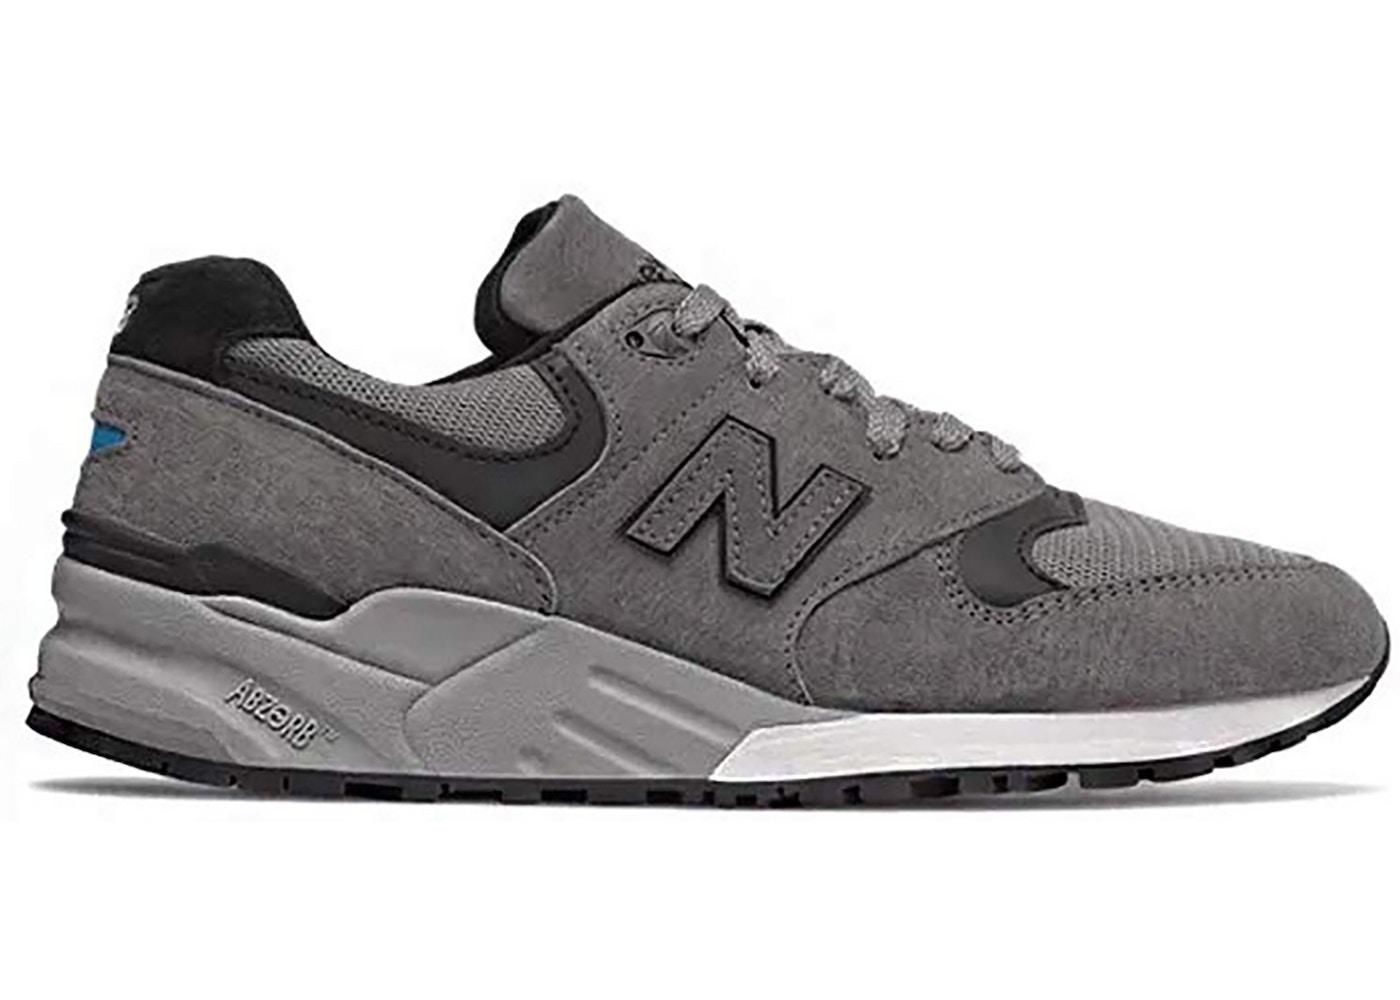 New Balance 999 Grey Pewter